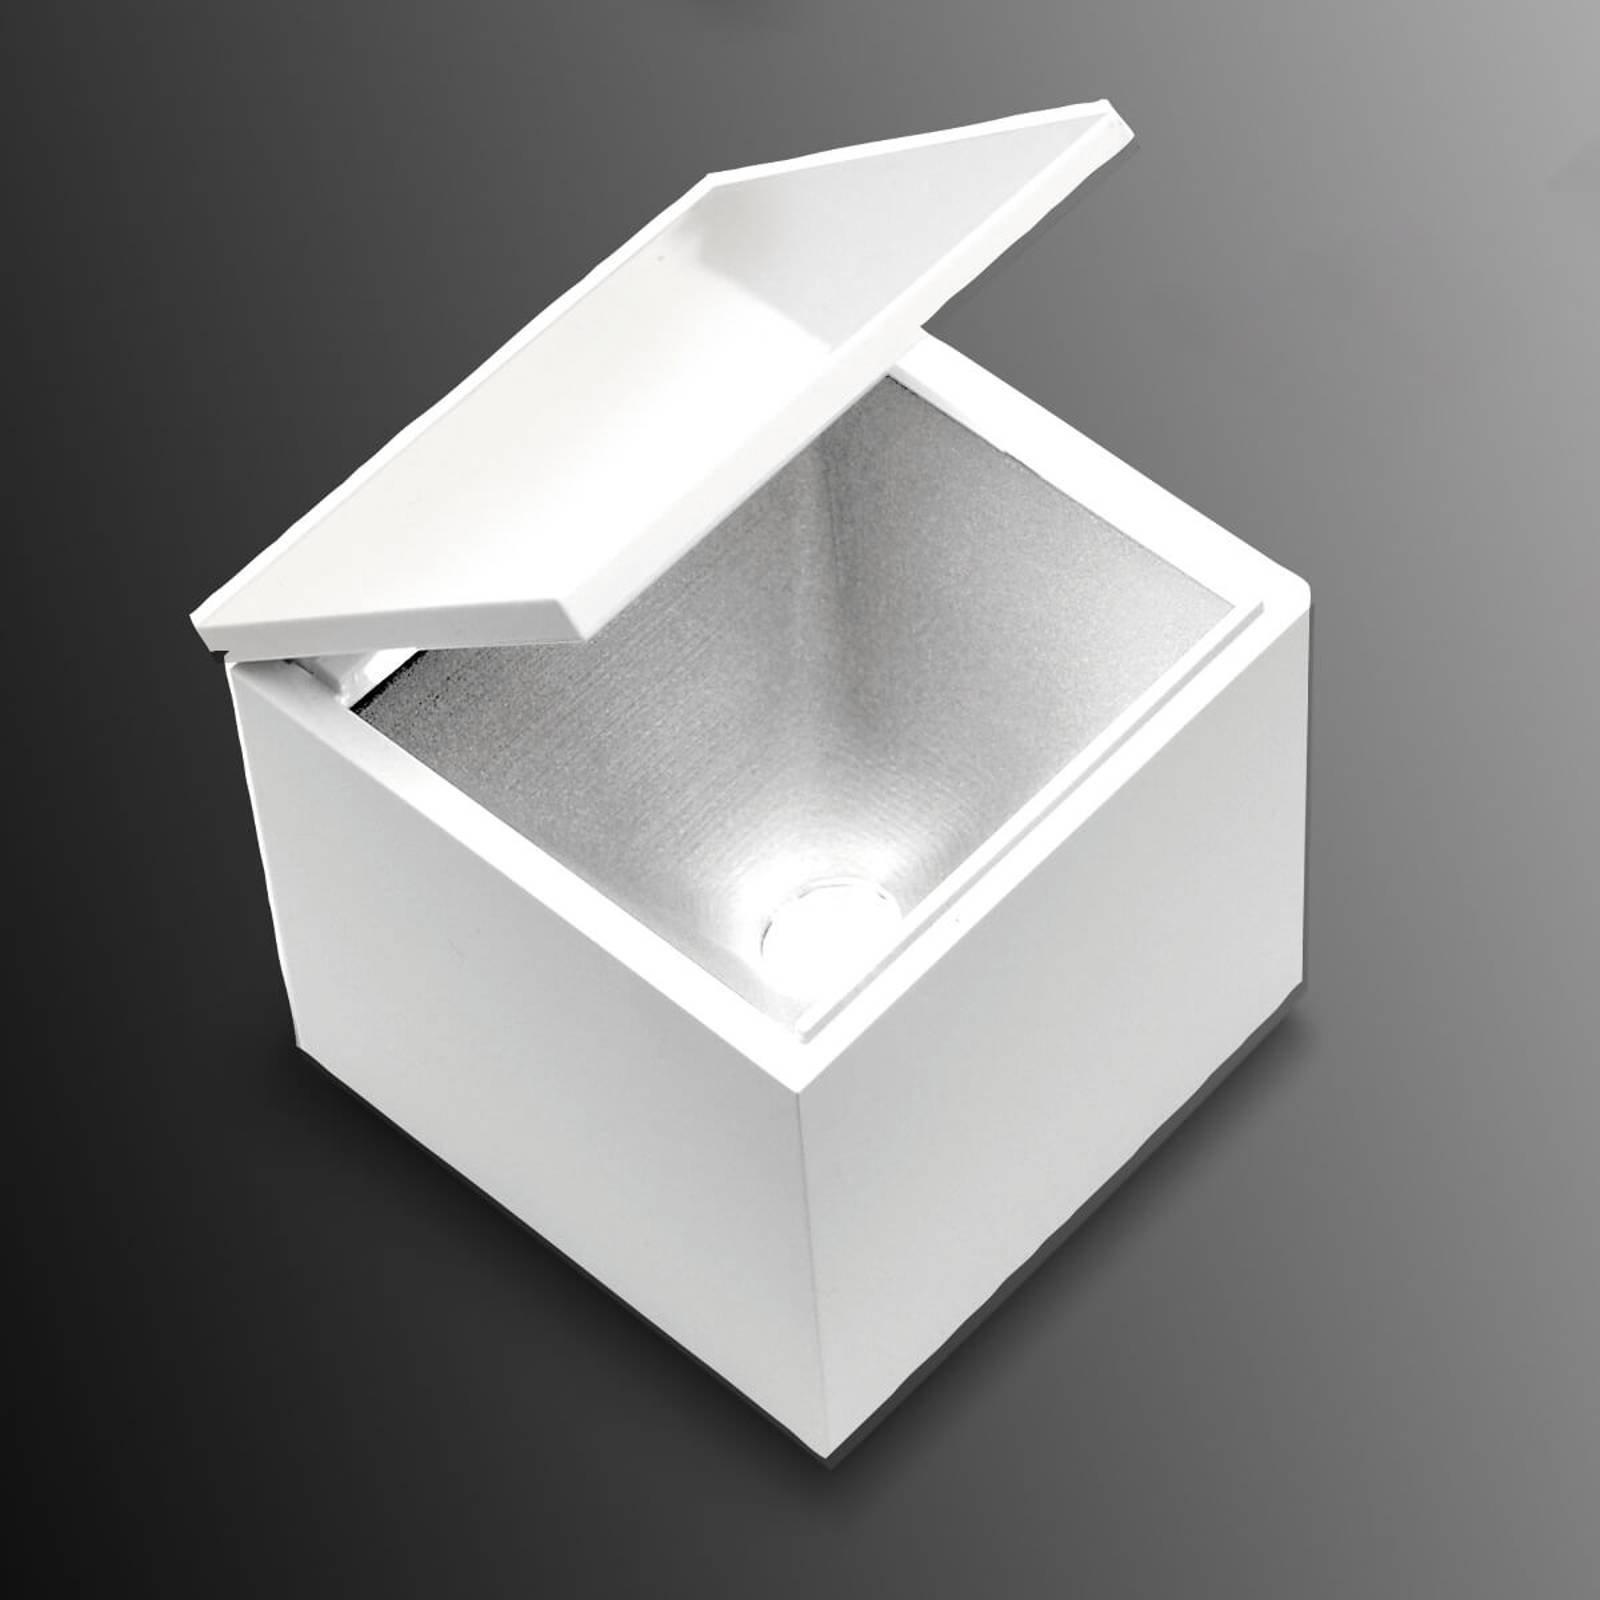 Cini&Nils Cuboled - LED-bordlampe i hvit